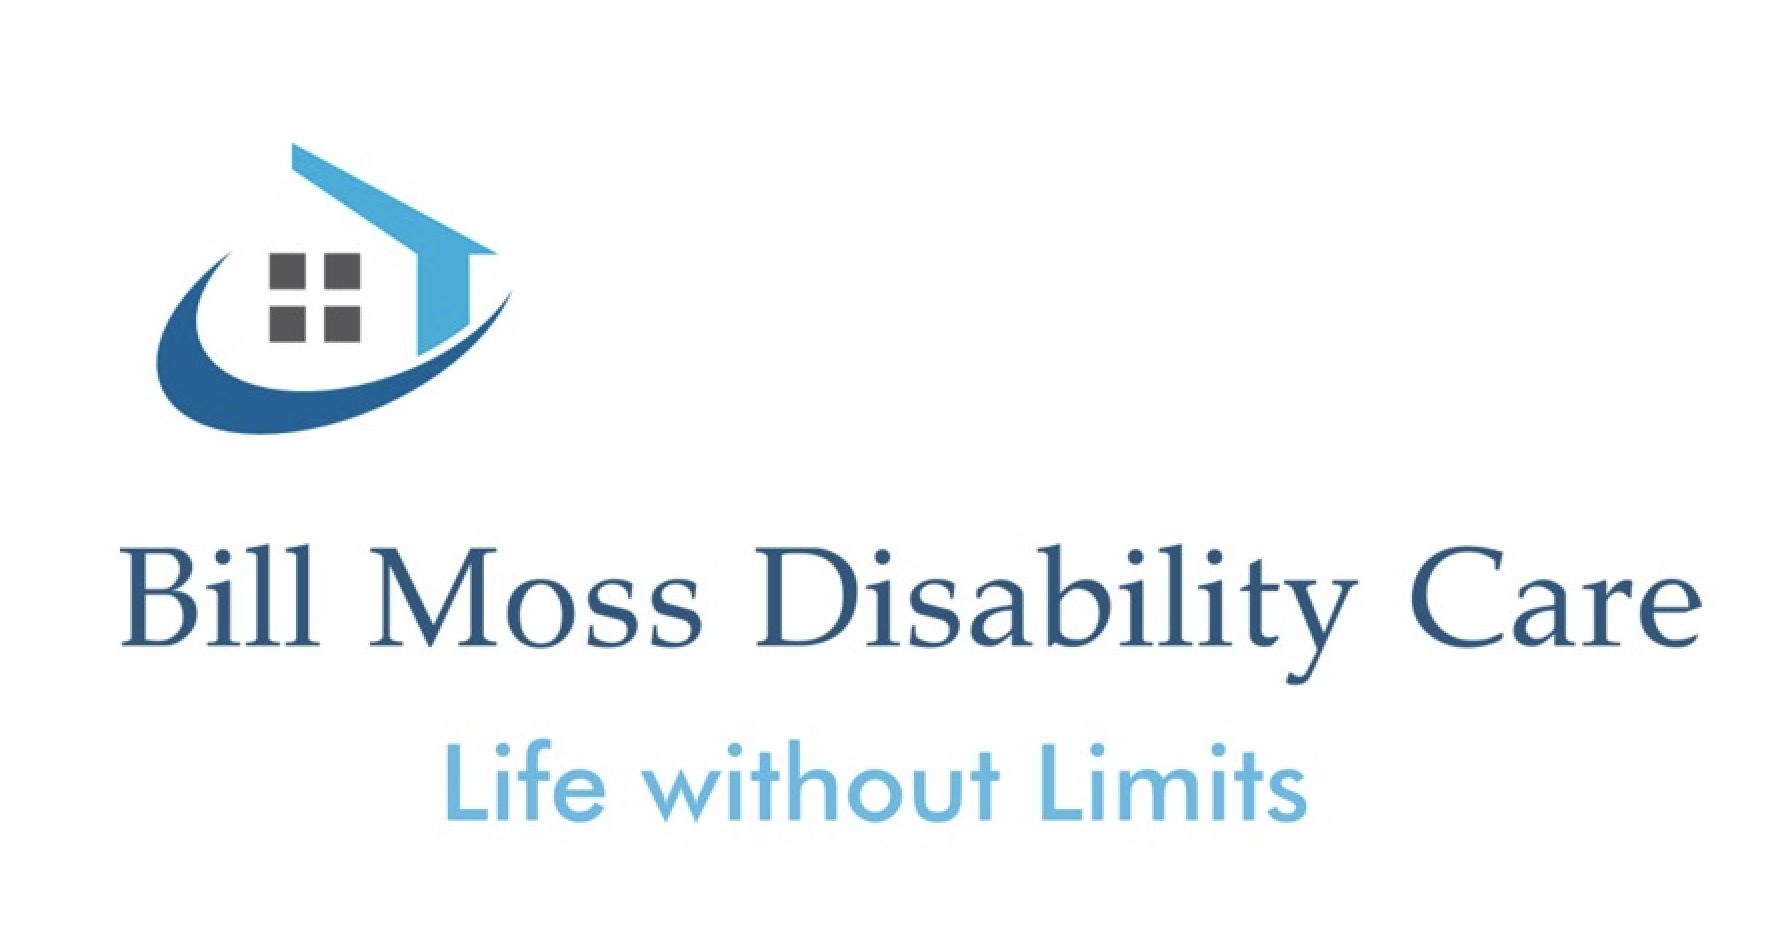 Bill Moss Disability Care